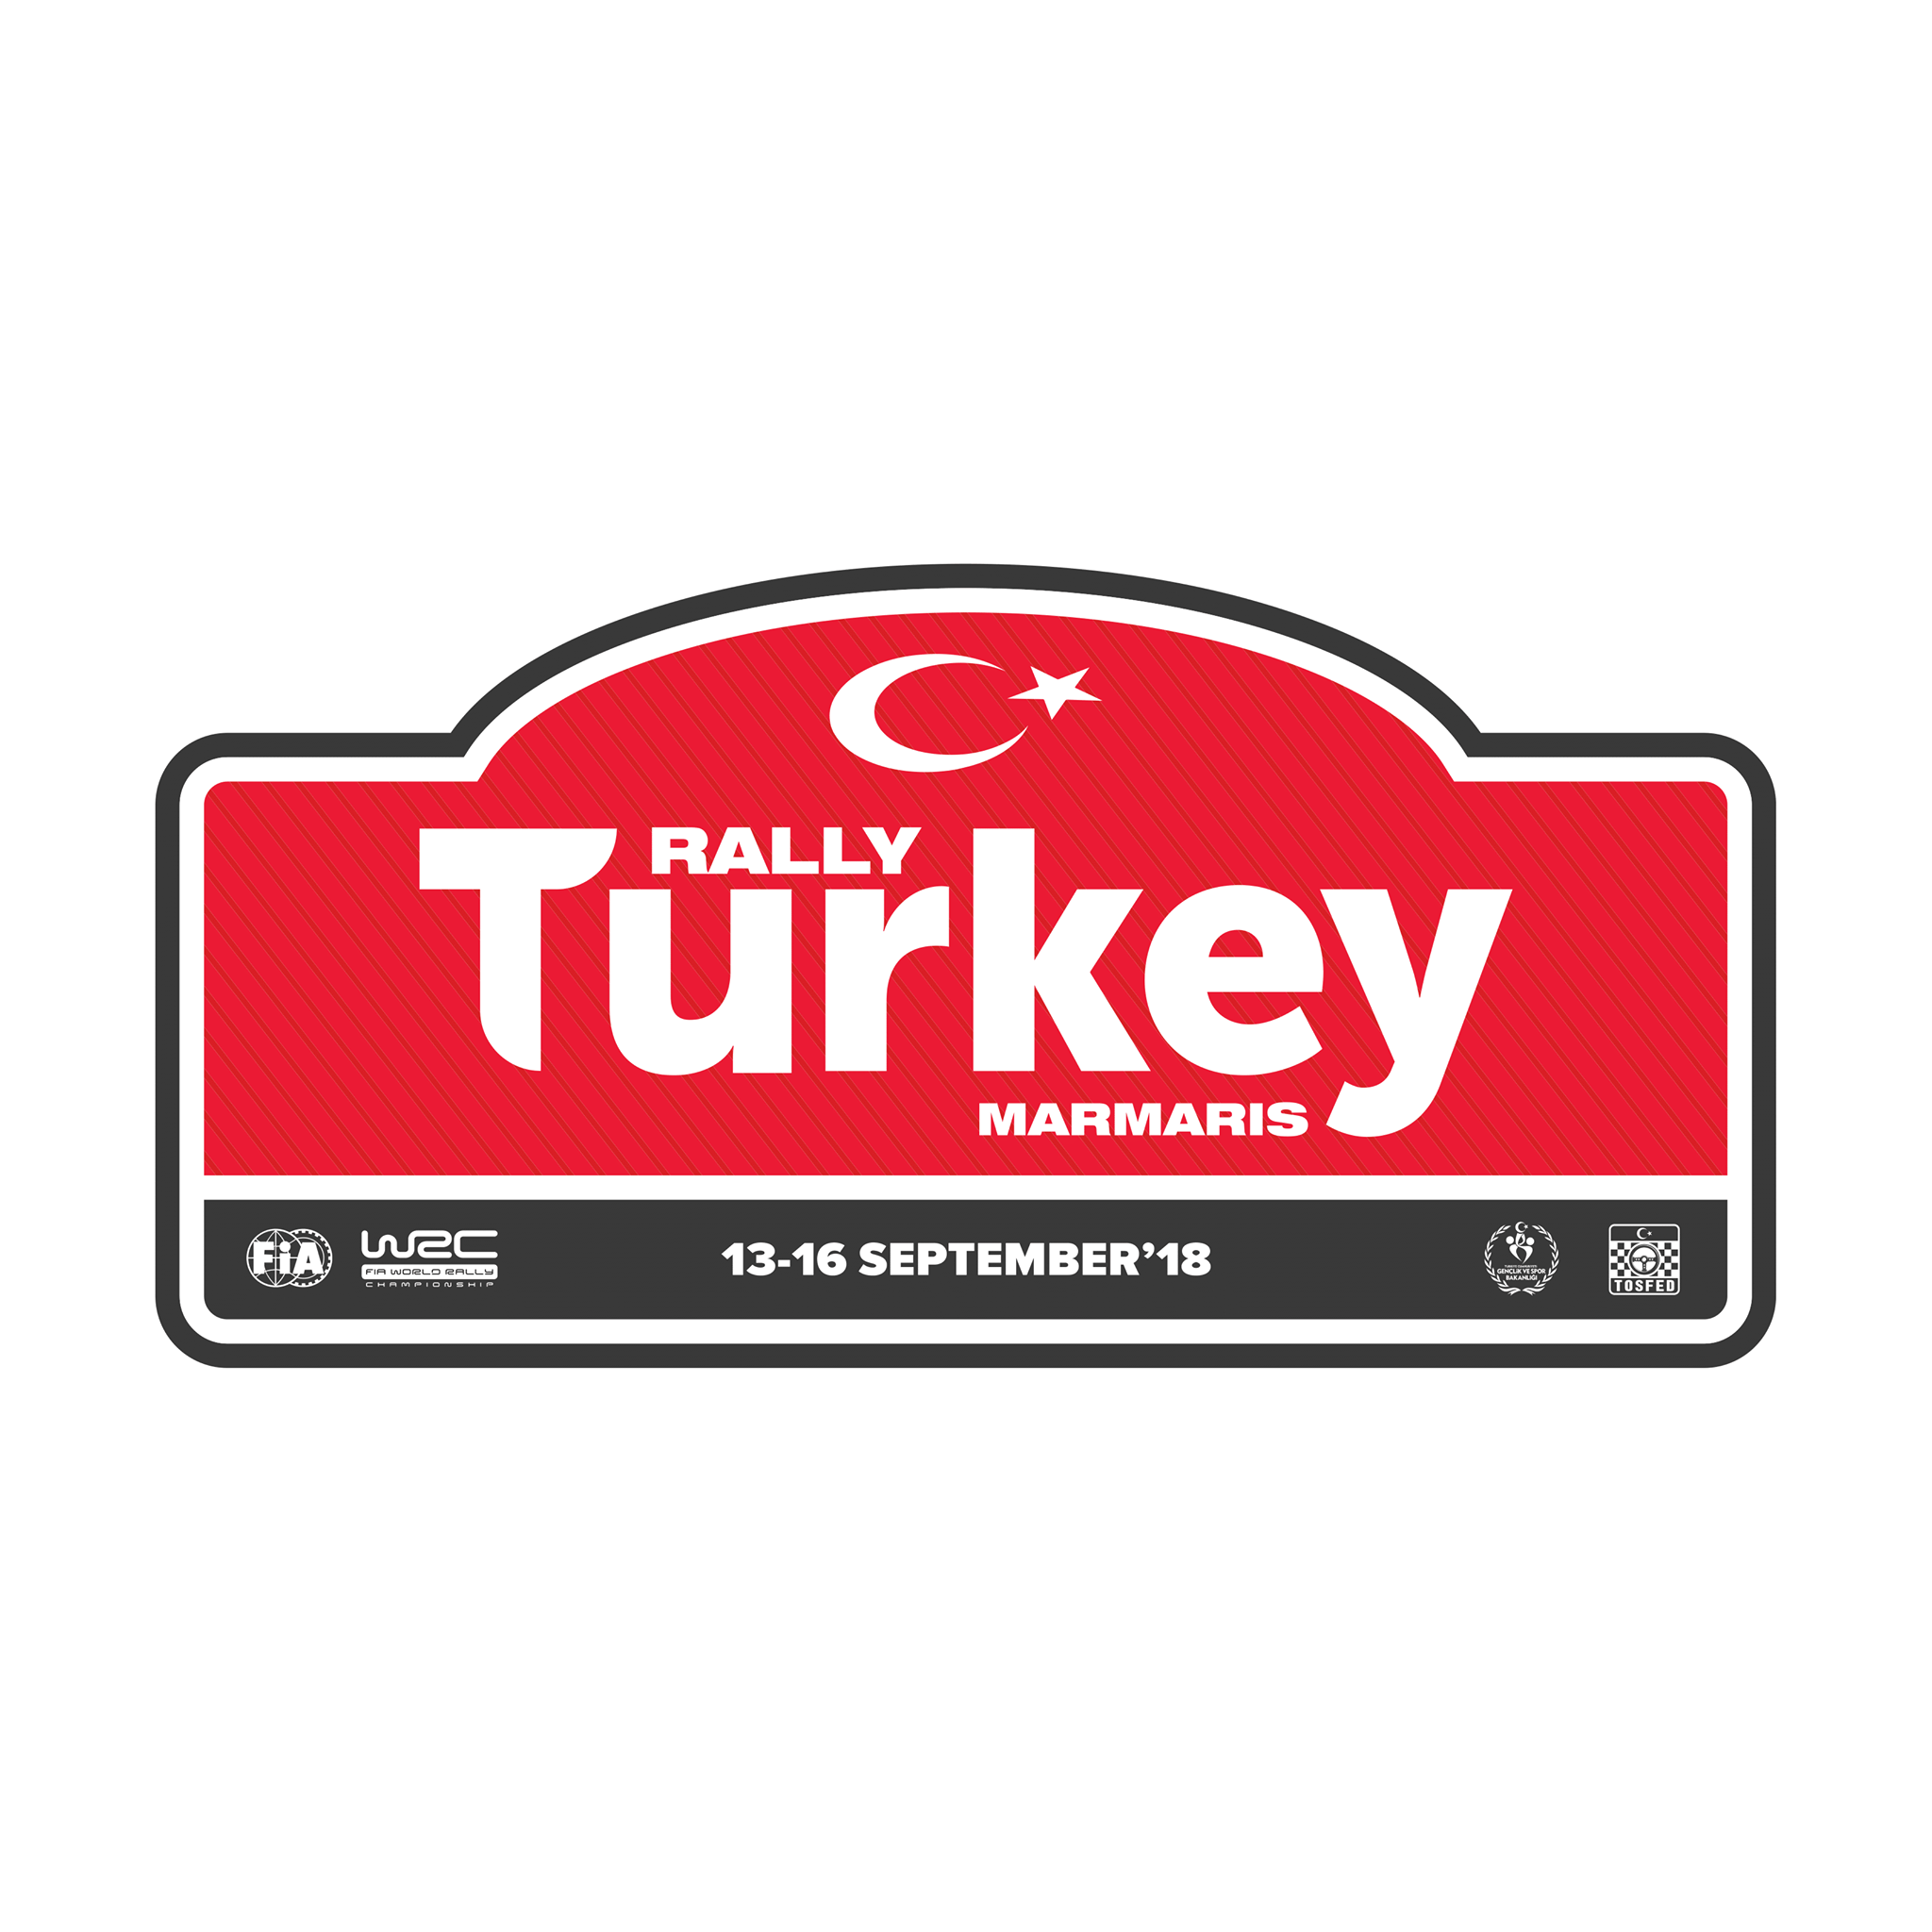 2018 World Rally Championship - Rally Turkey